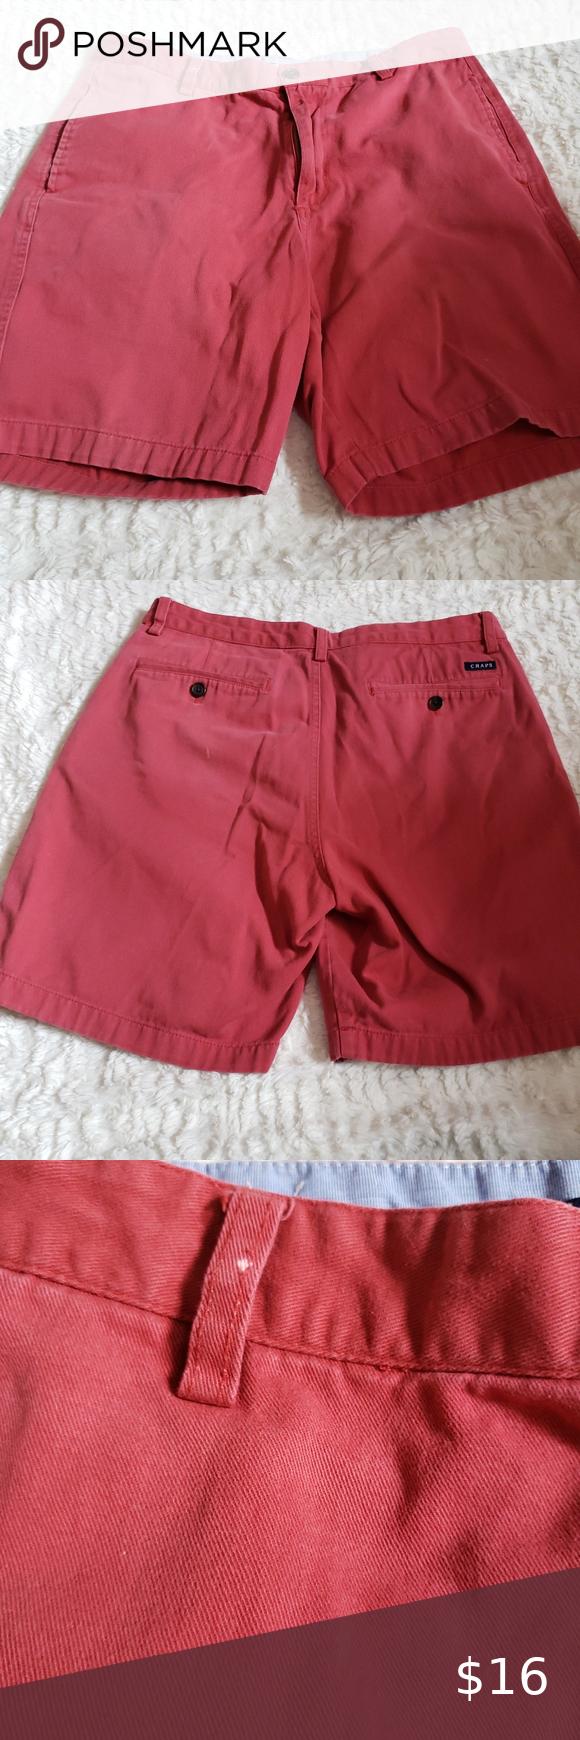 merlot cotton shorts MERLOT red shorts 1970s fringed shorts